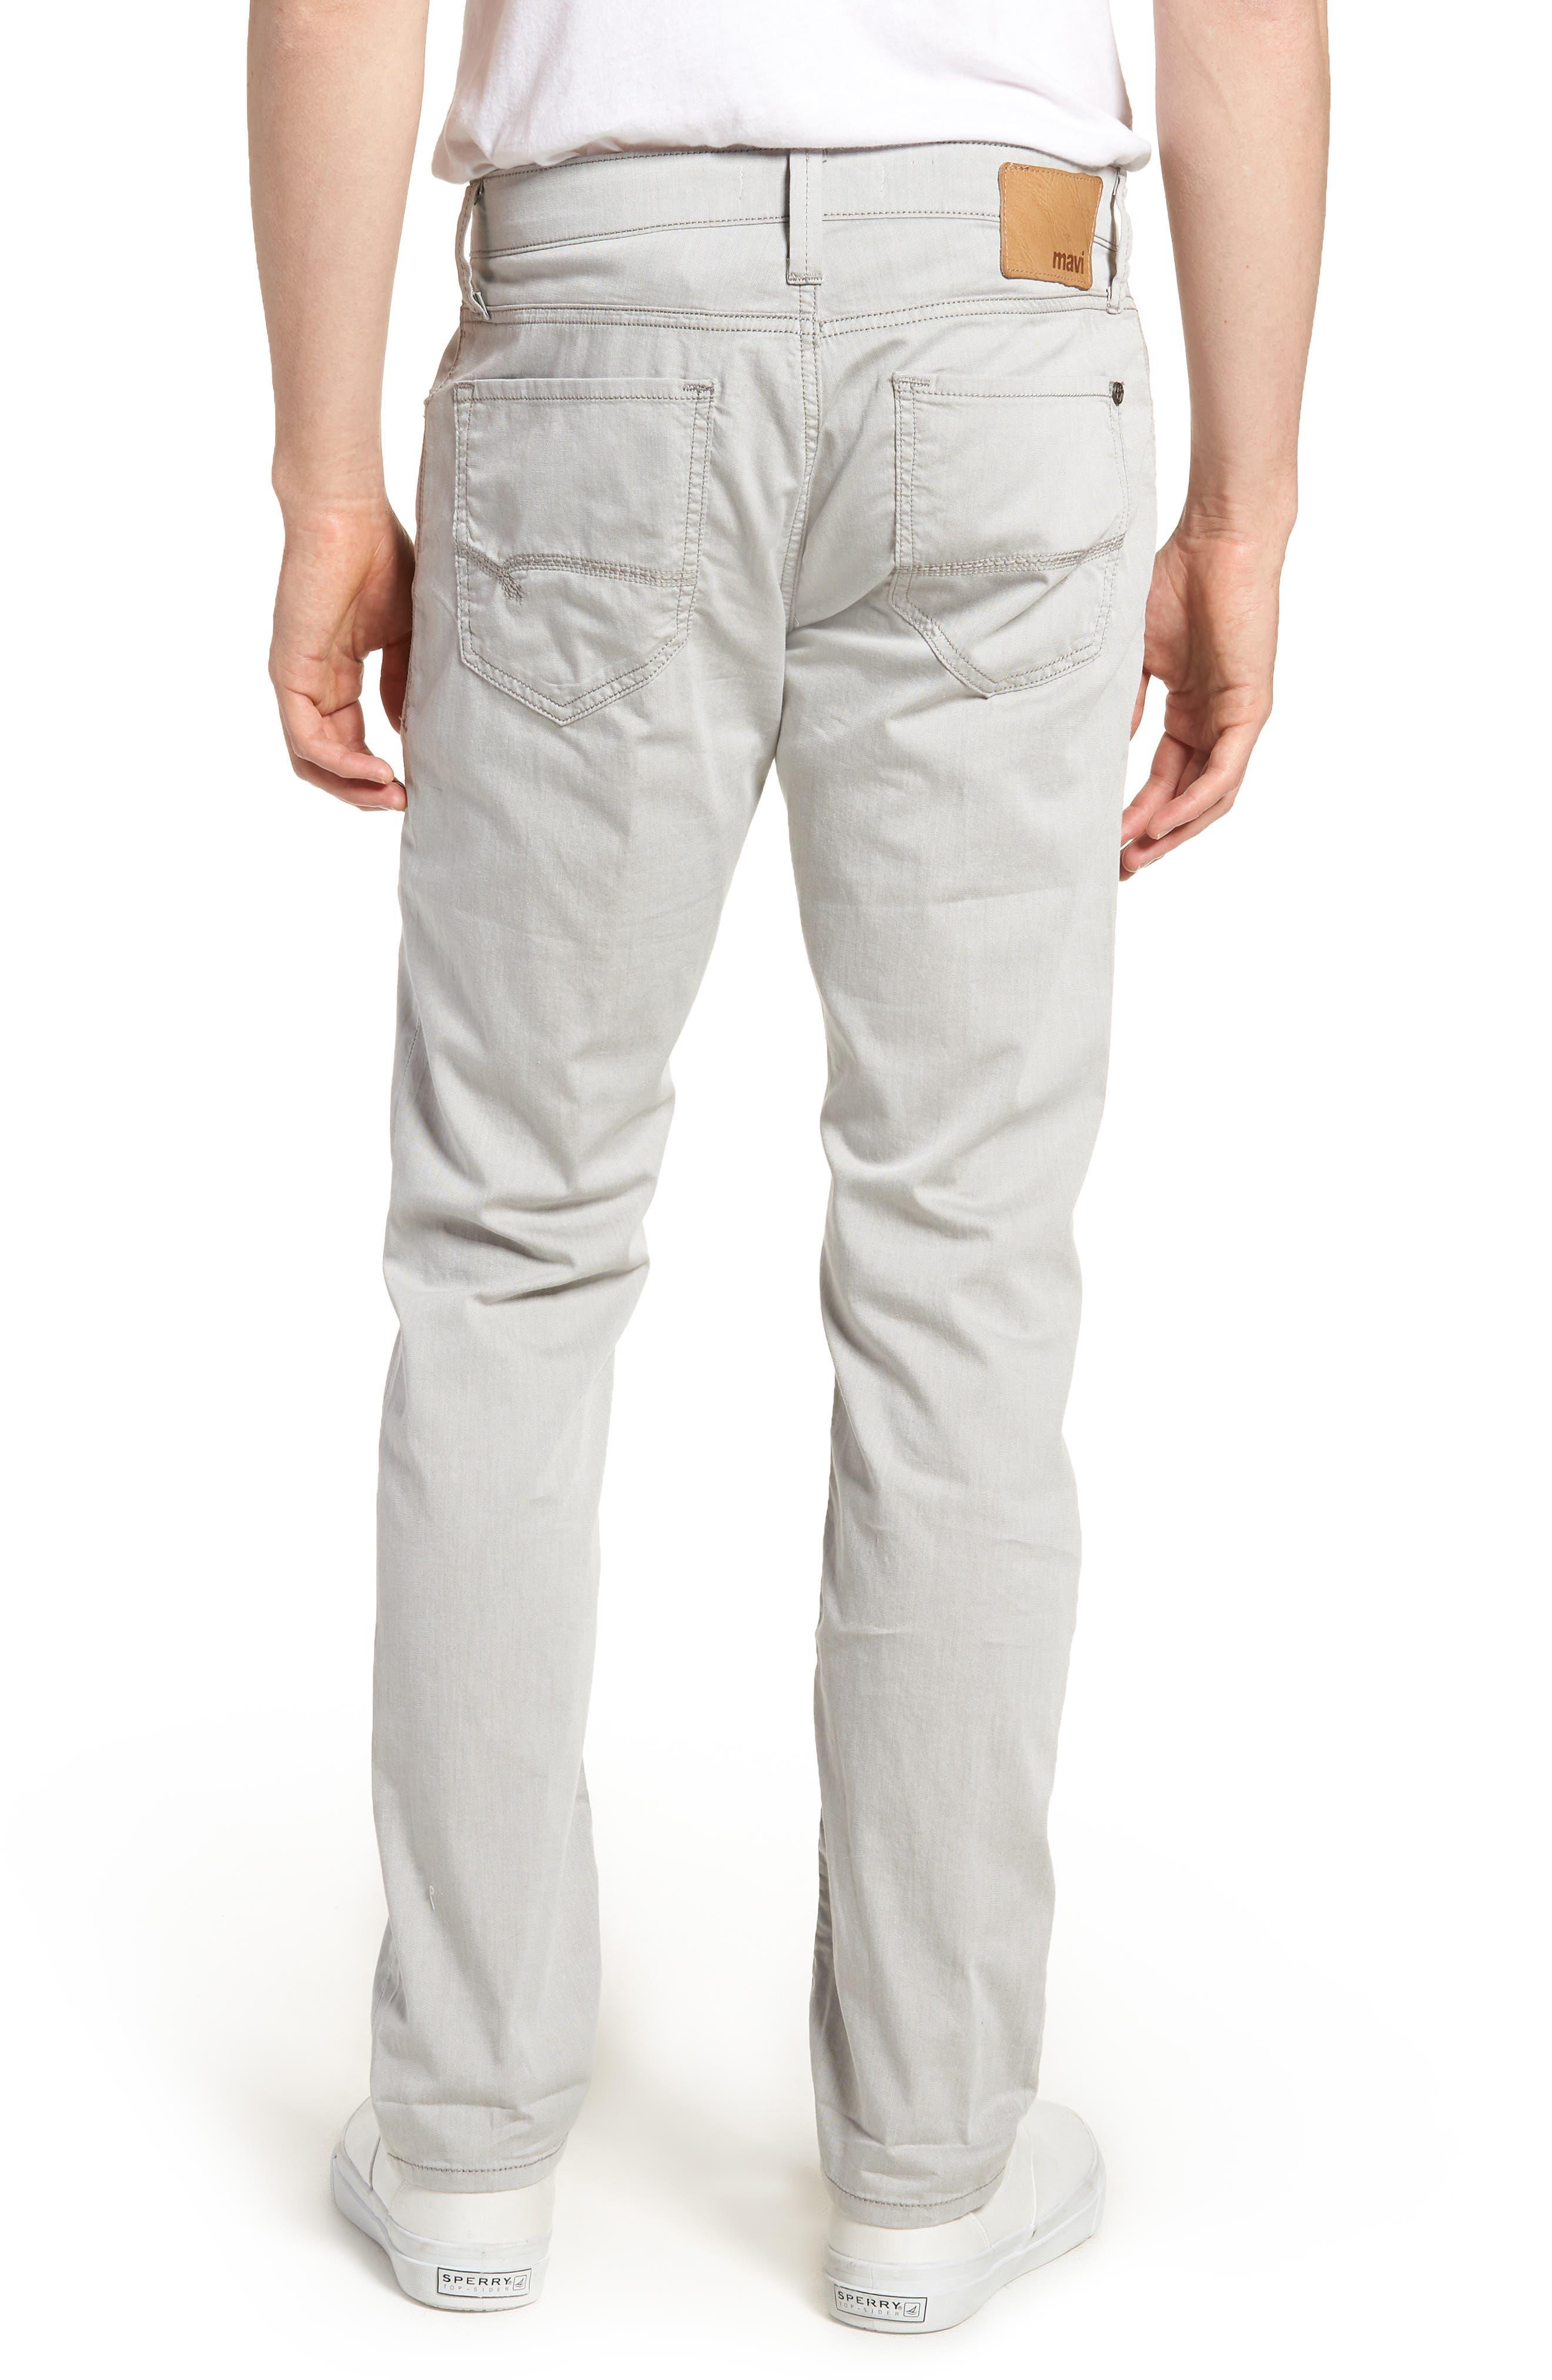 Jake Slim Fit Jeans,                             Alternate thumbnail 2, color,                             Latte Reversed